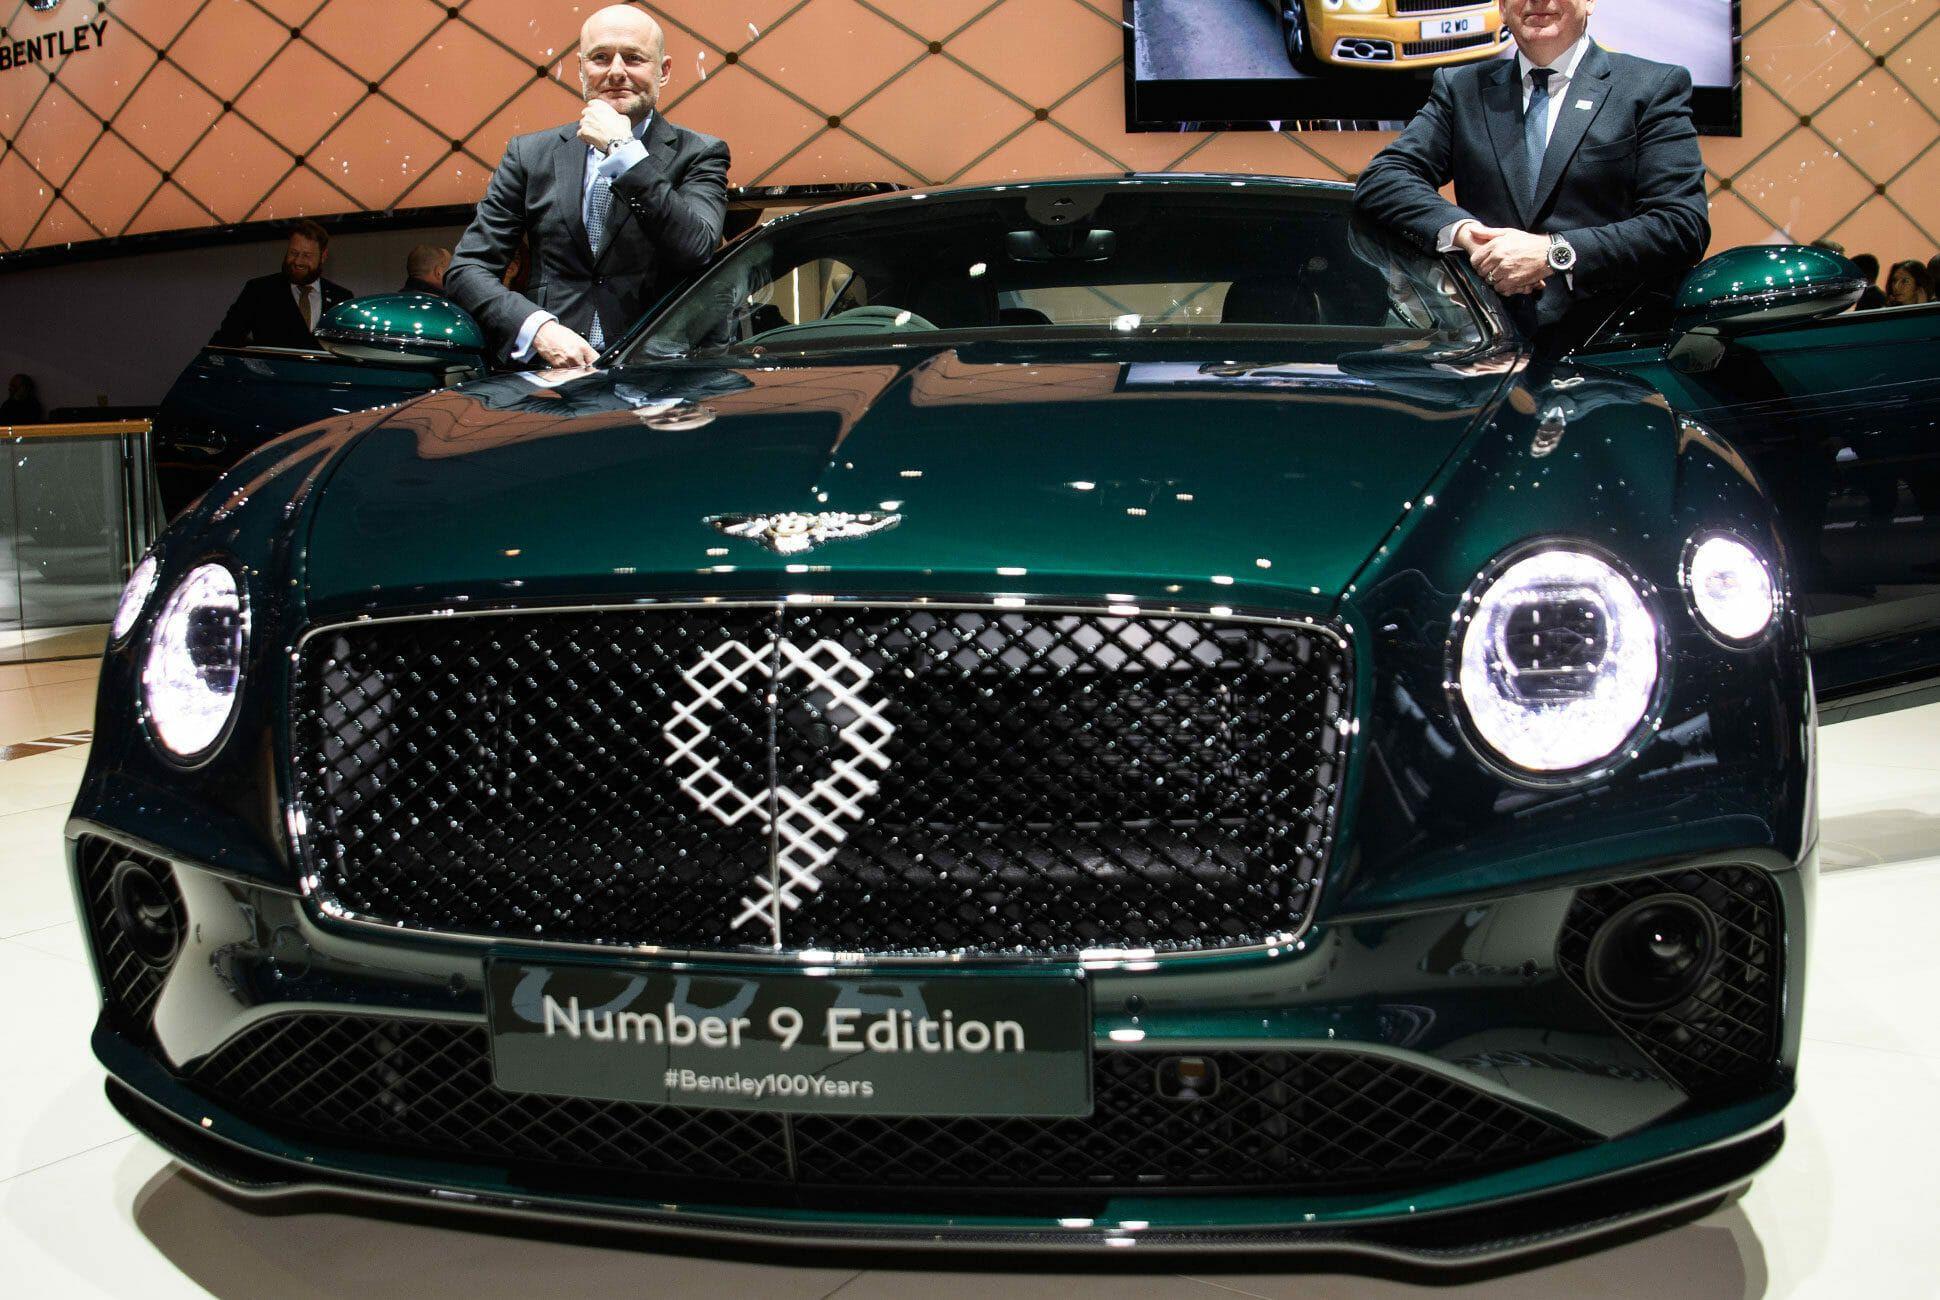 Breitling-Premier-Bentley-Centenary-gear-patrol-slide-004